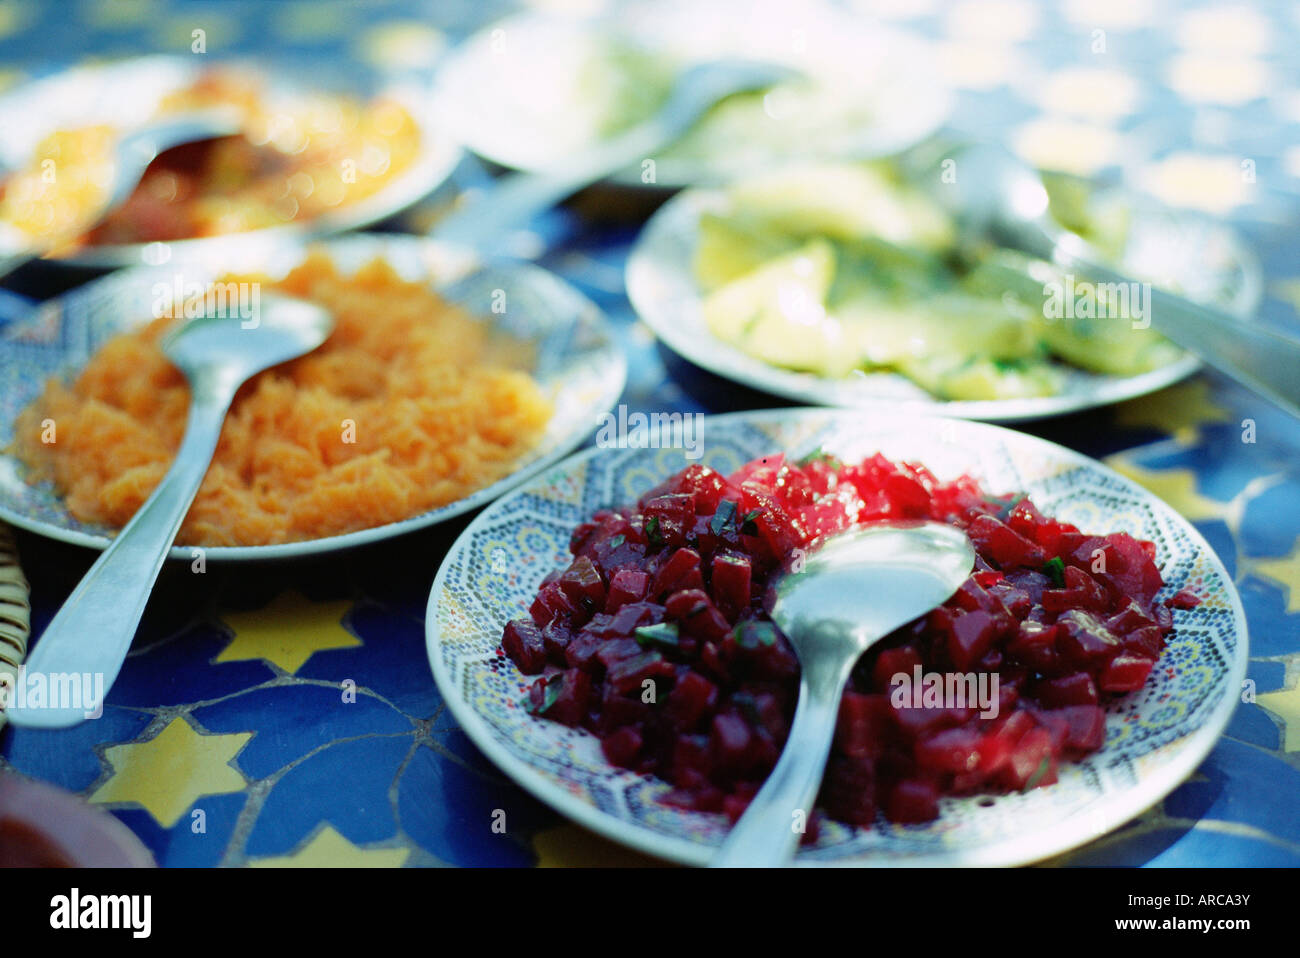 Platten aus marokkanischer Salat, traditionelle Vorspeise in Restaurants, Afrika, Nordafrika, Marokko, Marrakesch Stockbild